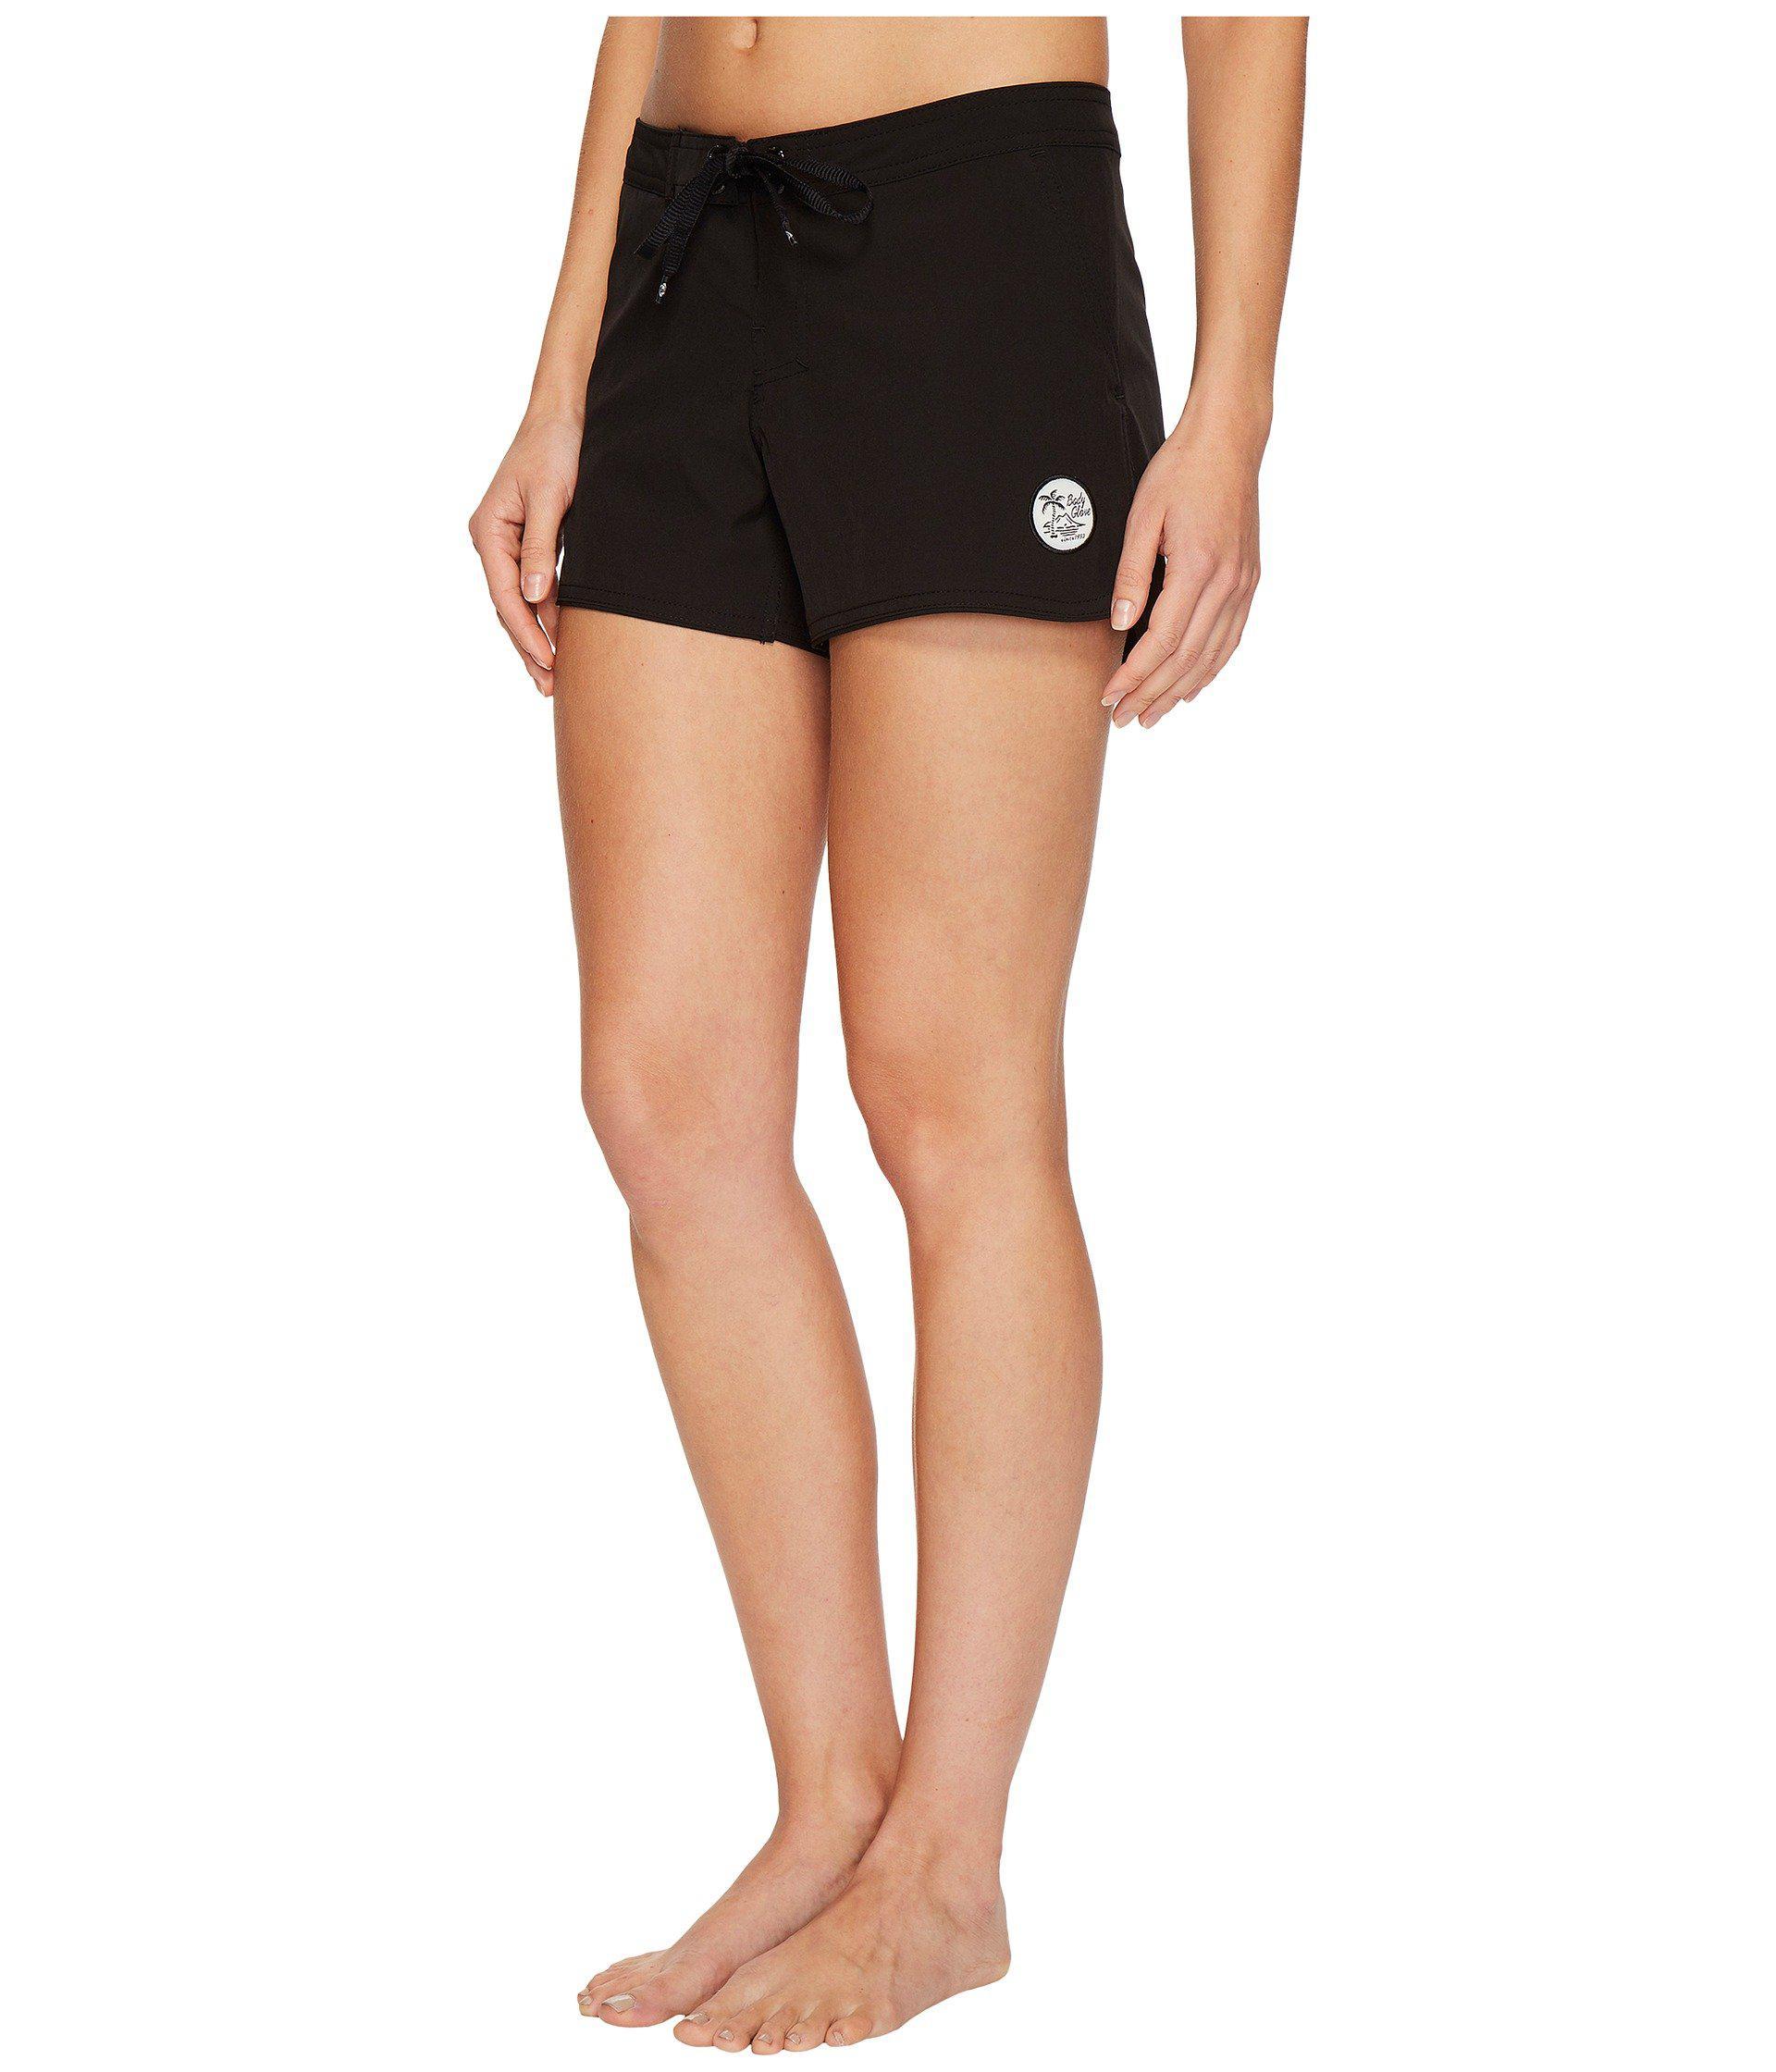 8d026c6c74a Lyst - Body Glove Smoothies Blacks Beach Vapor Boardshorts (peacock) Women s  Swimwear in Black